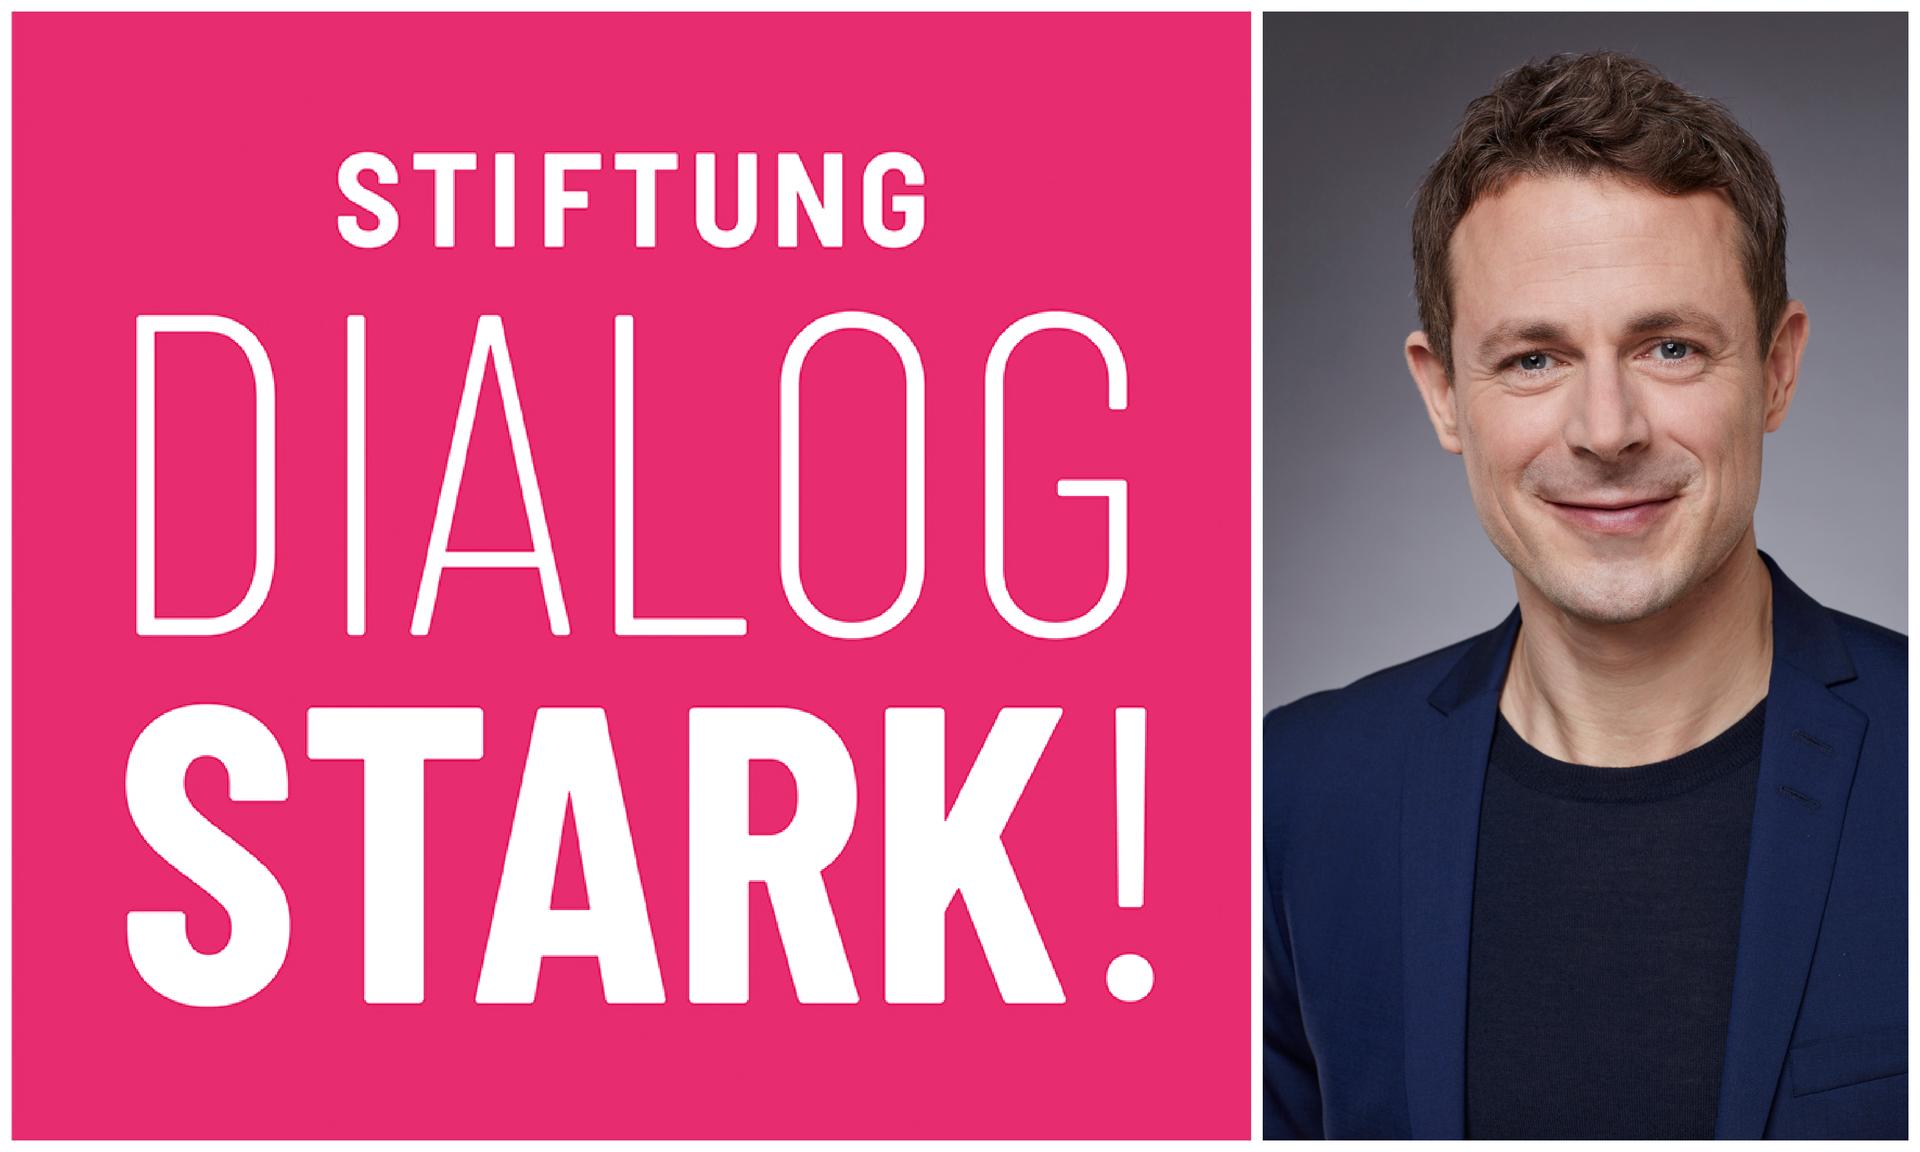 Stiftung Dialog Stark!